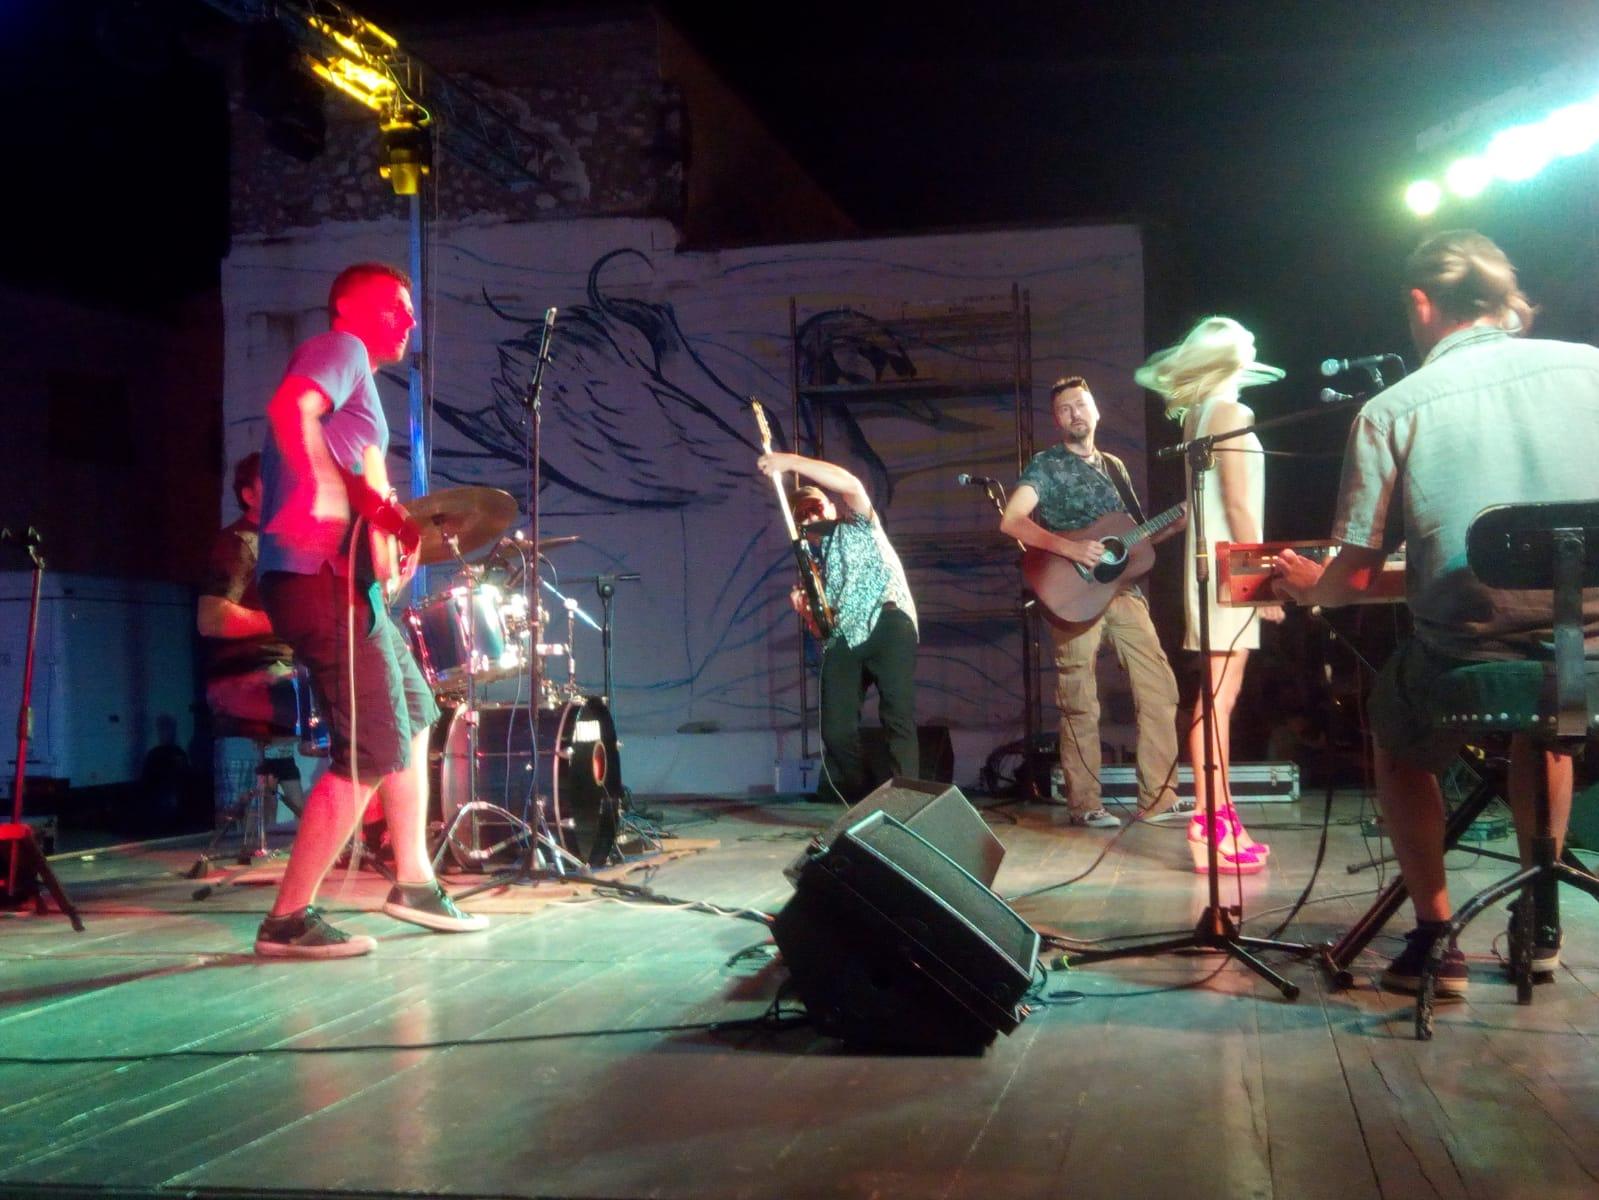 Održan koncert grupe Positivo